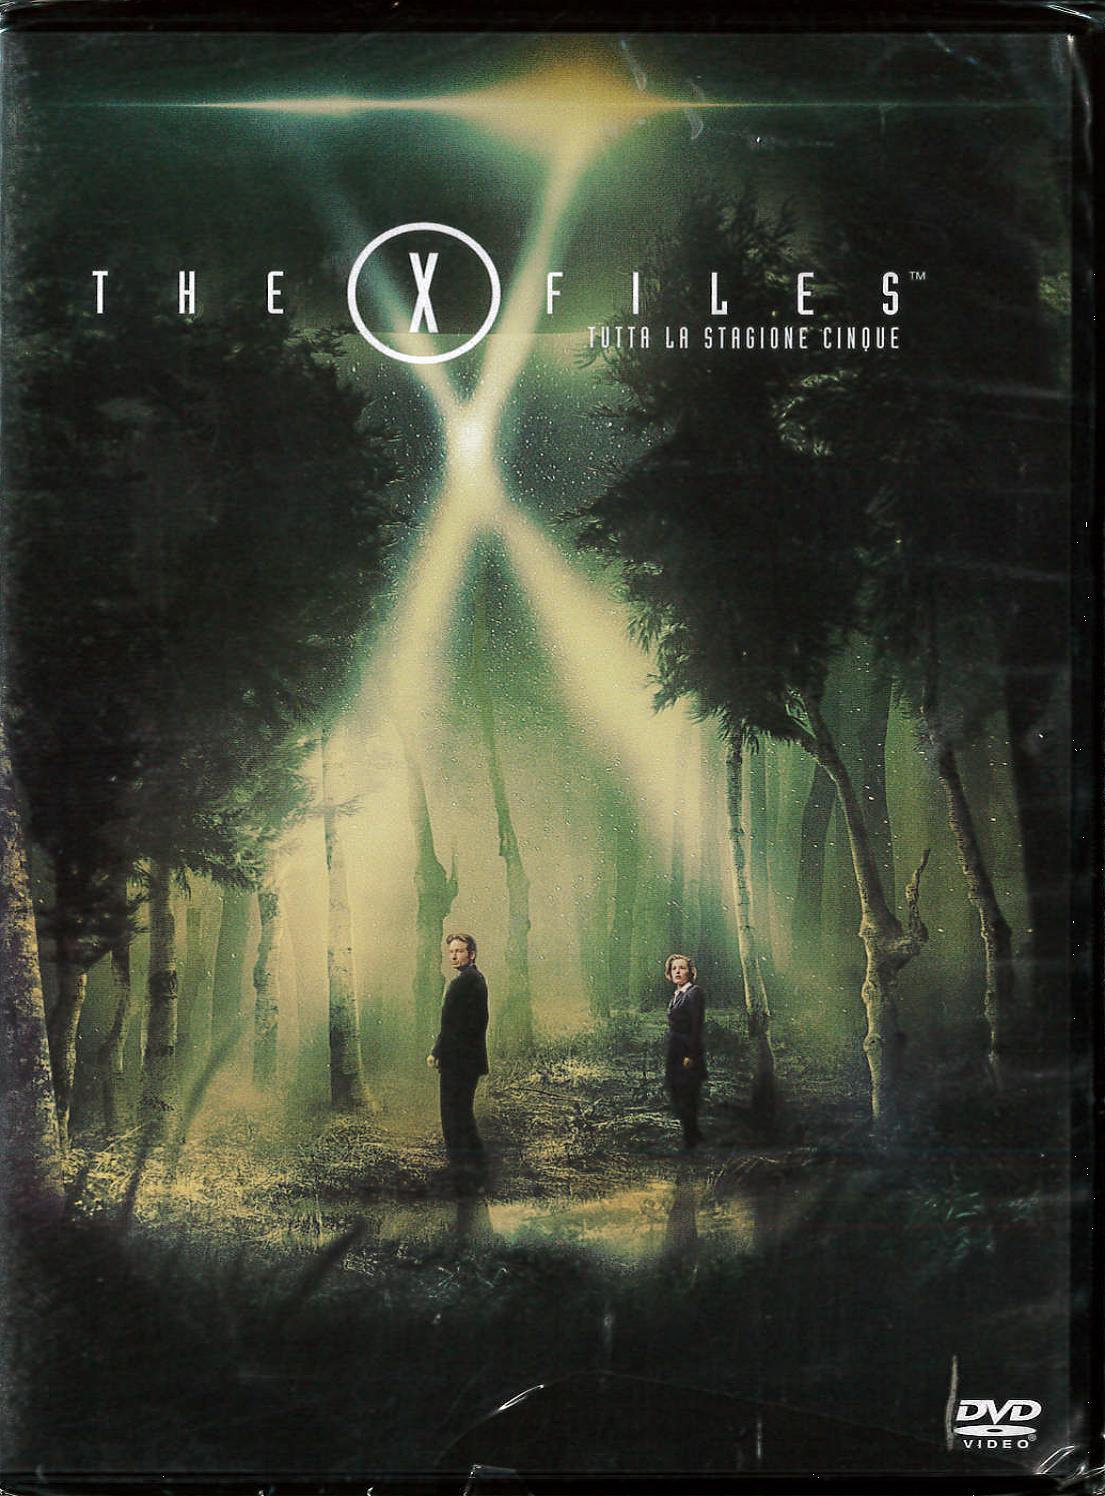 COF.THE X FILES 05 (6 DVD) (DVD)